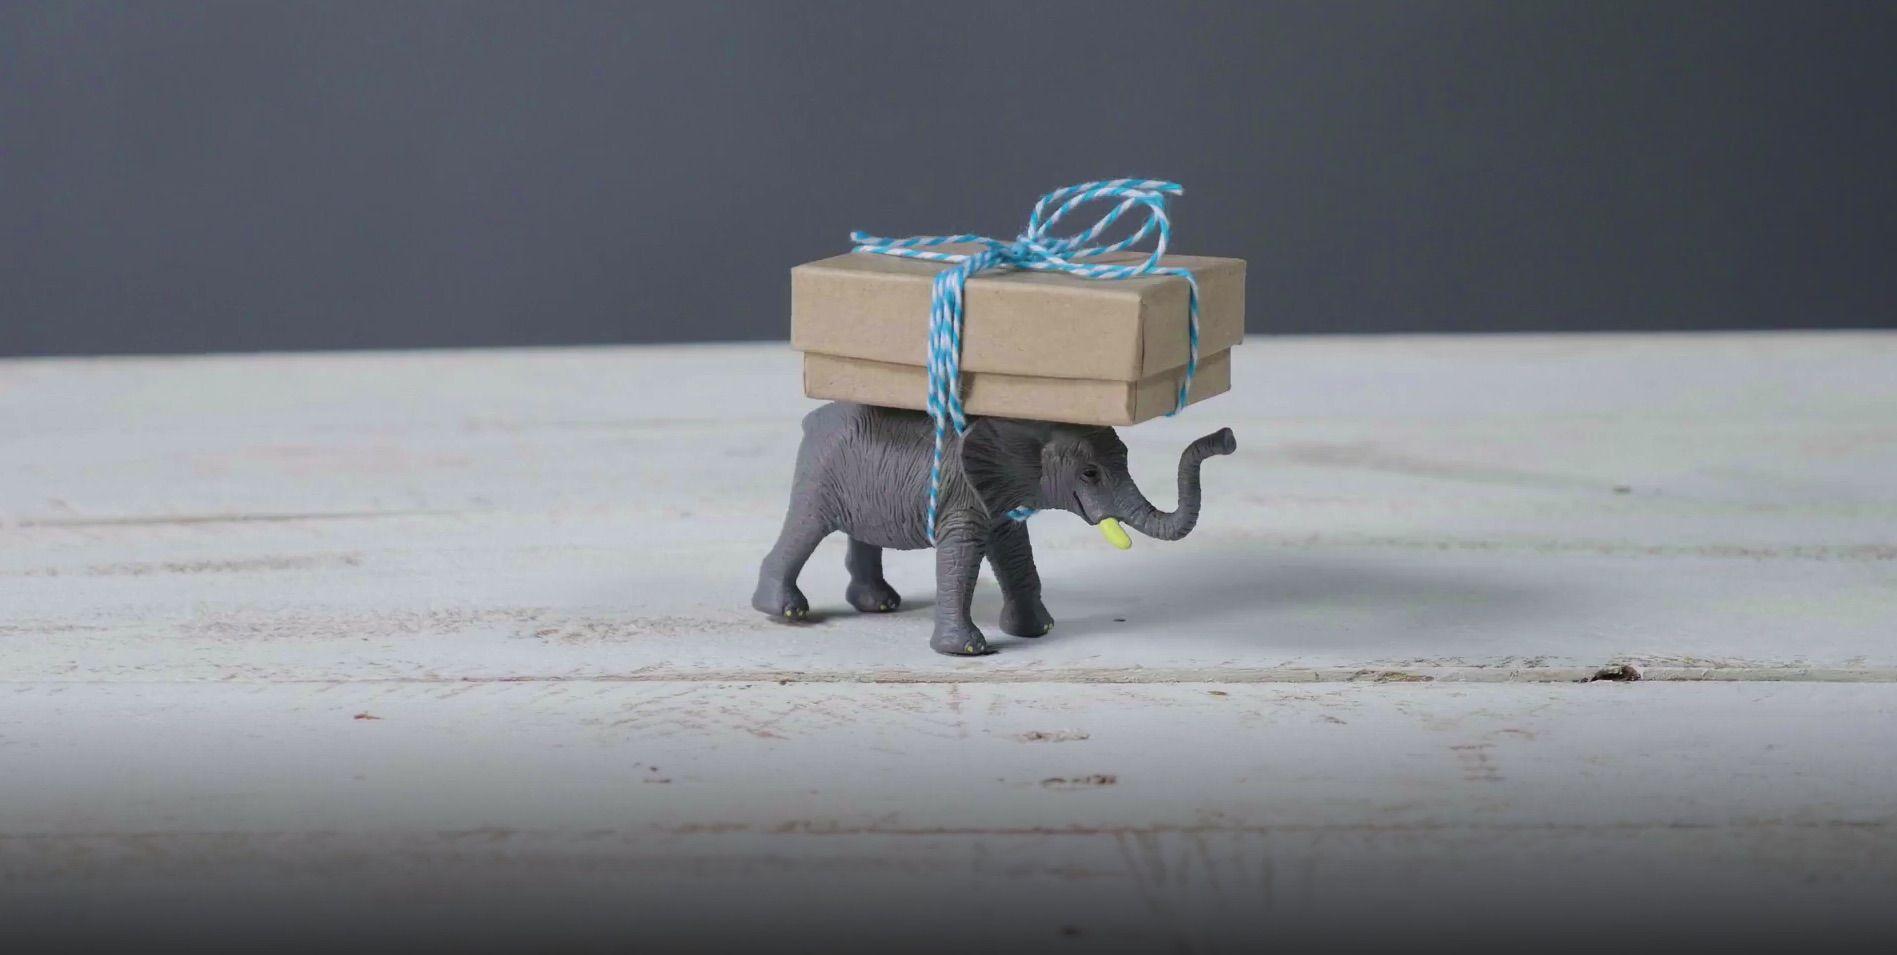 Tiny elephant carrying present.